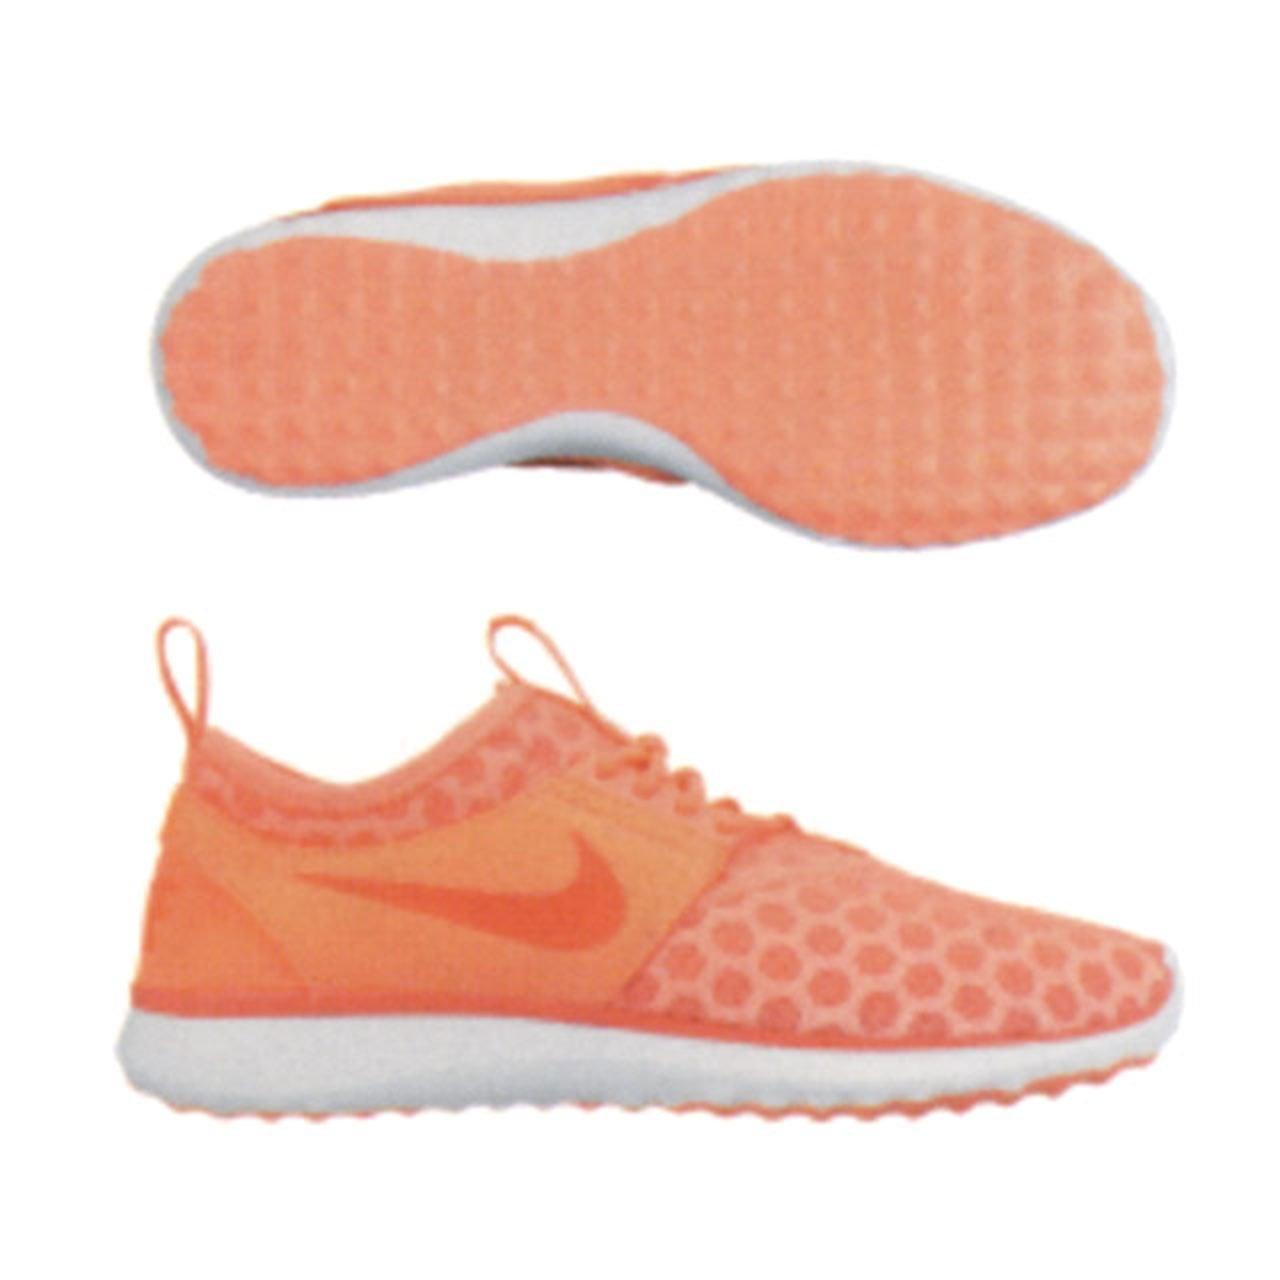 Nike Women's 'Zenji' Sneakers EUR 42 Coral